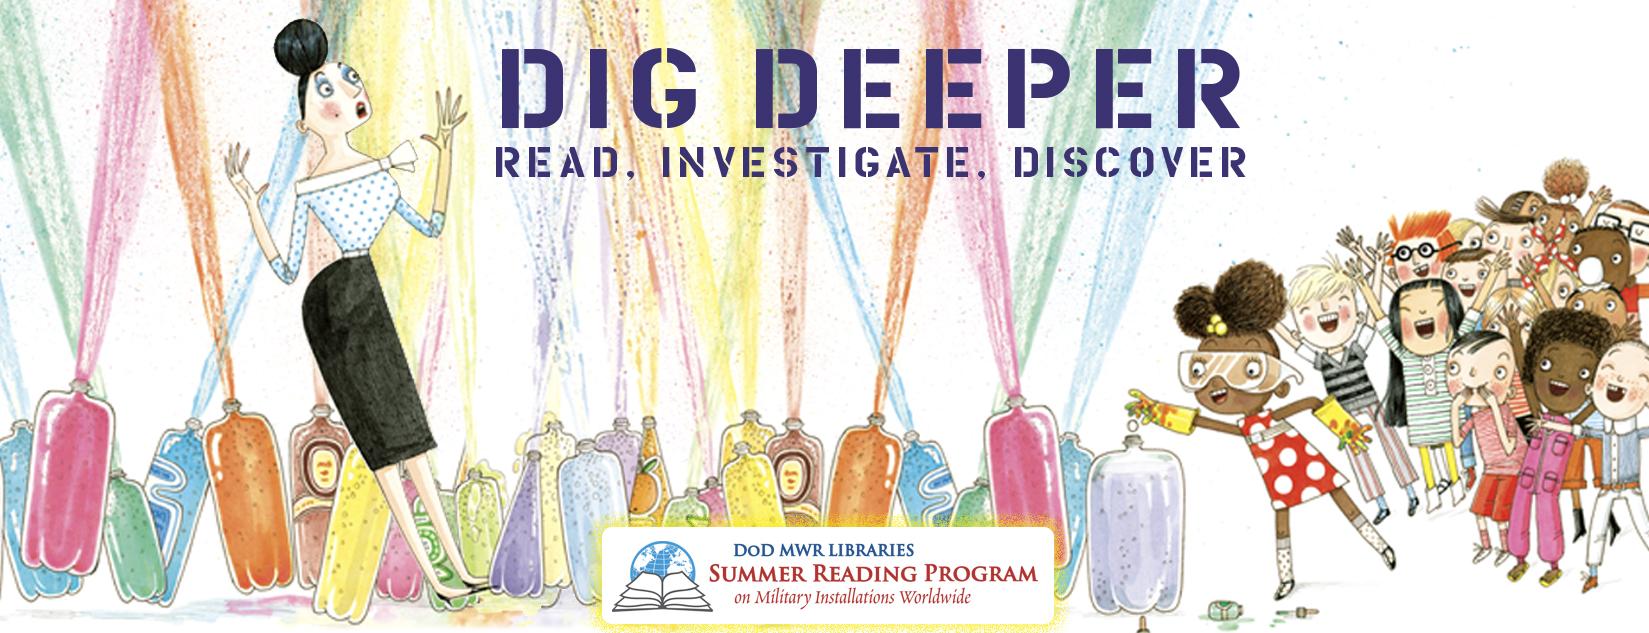 Cybrary Summer Reading Program